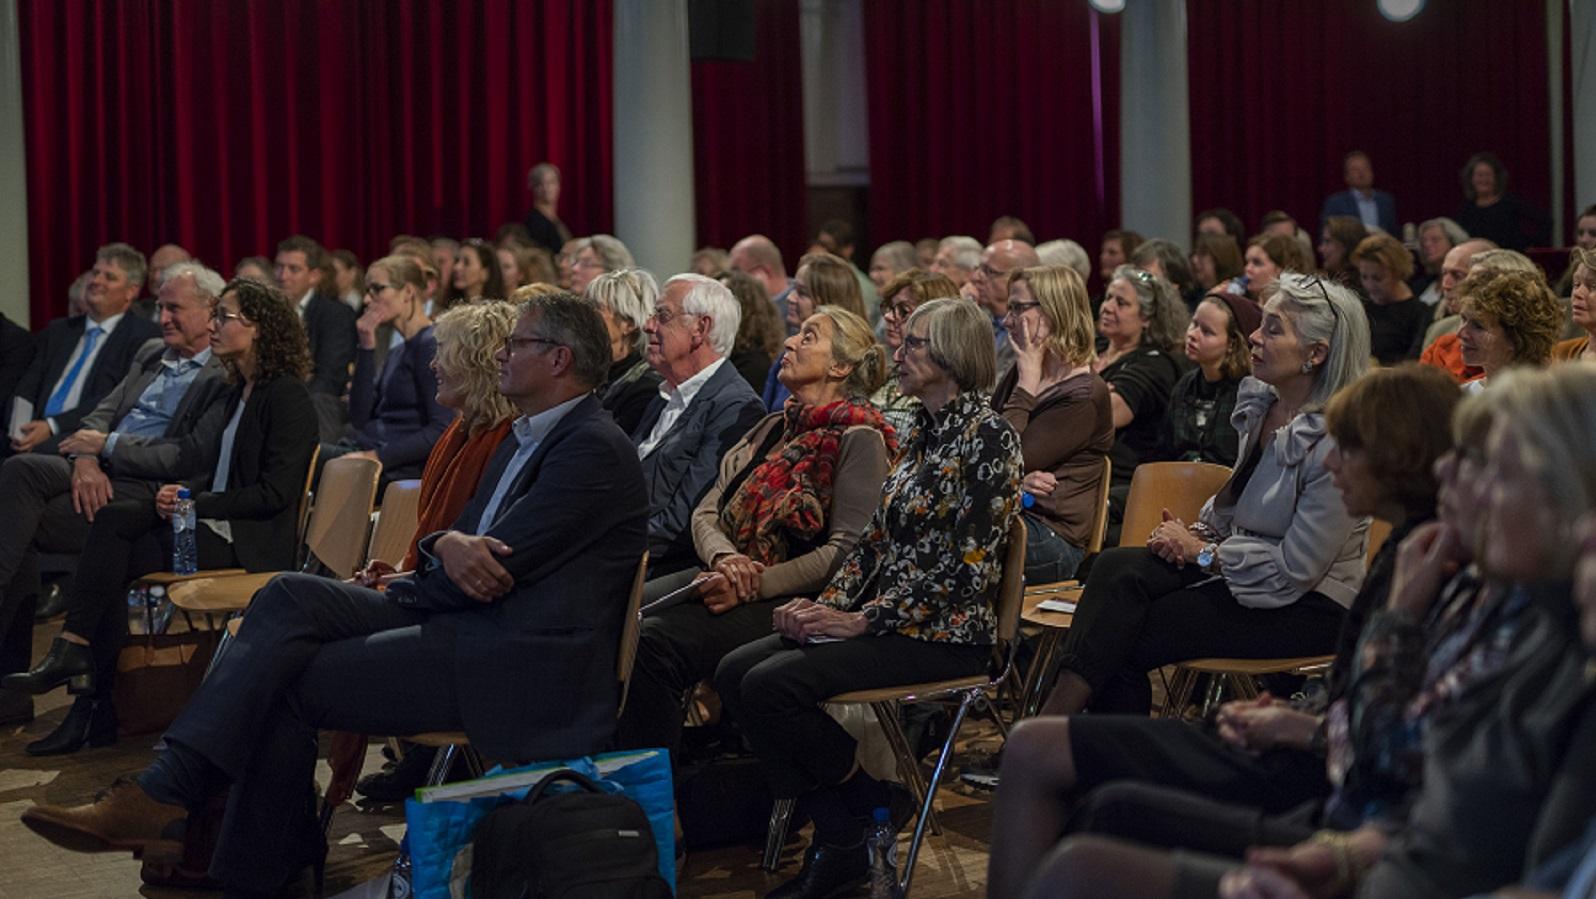 SSR Meillo-lezing 2018 Rode Hoed publiek luisteren naar lezing